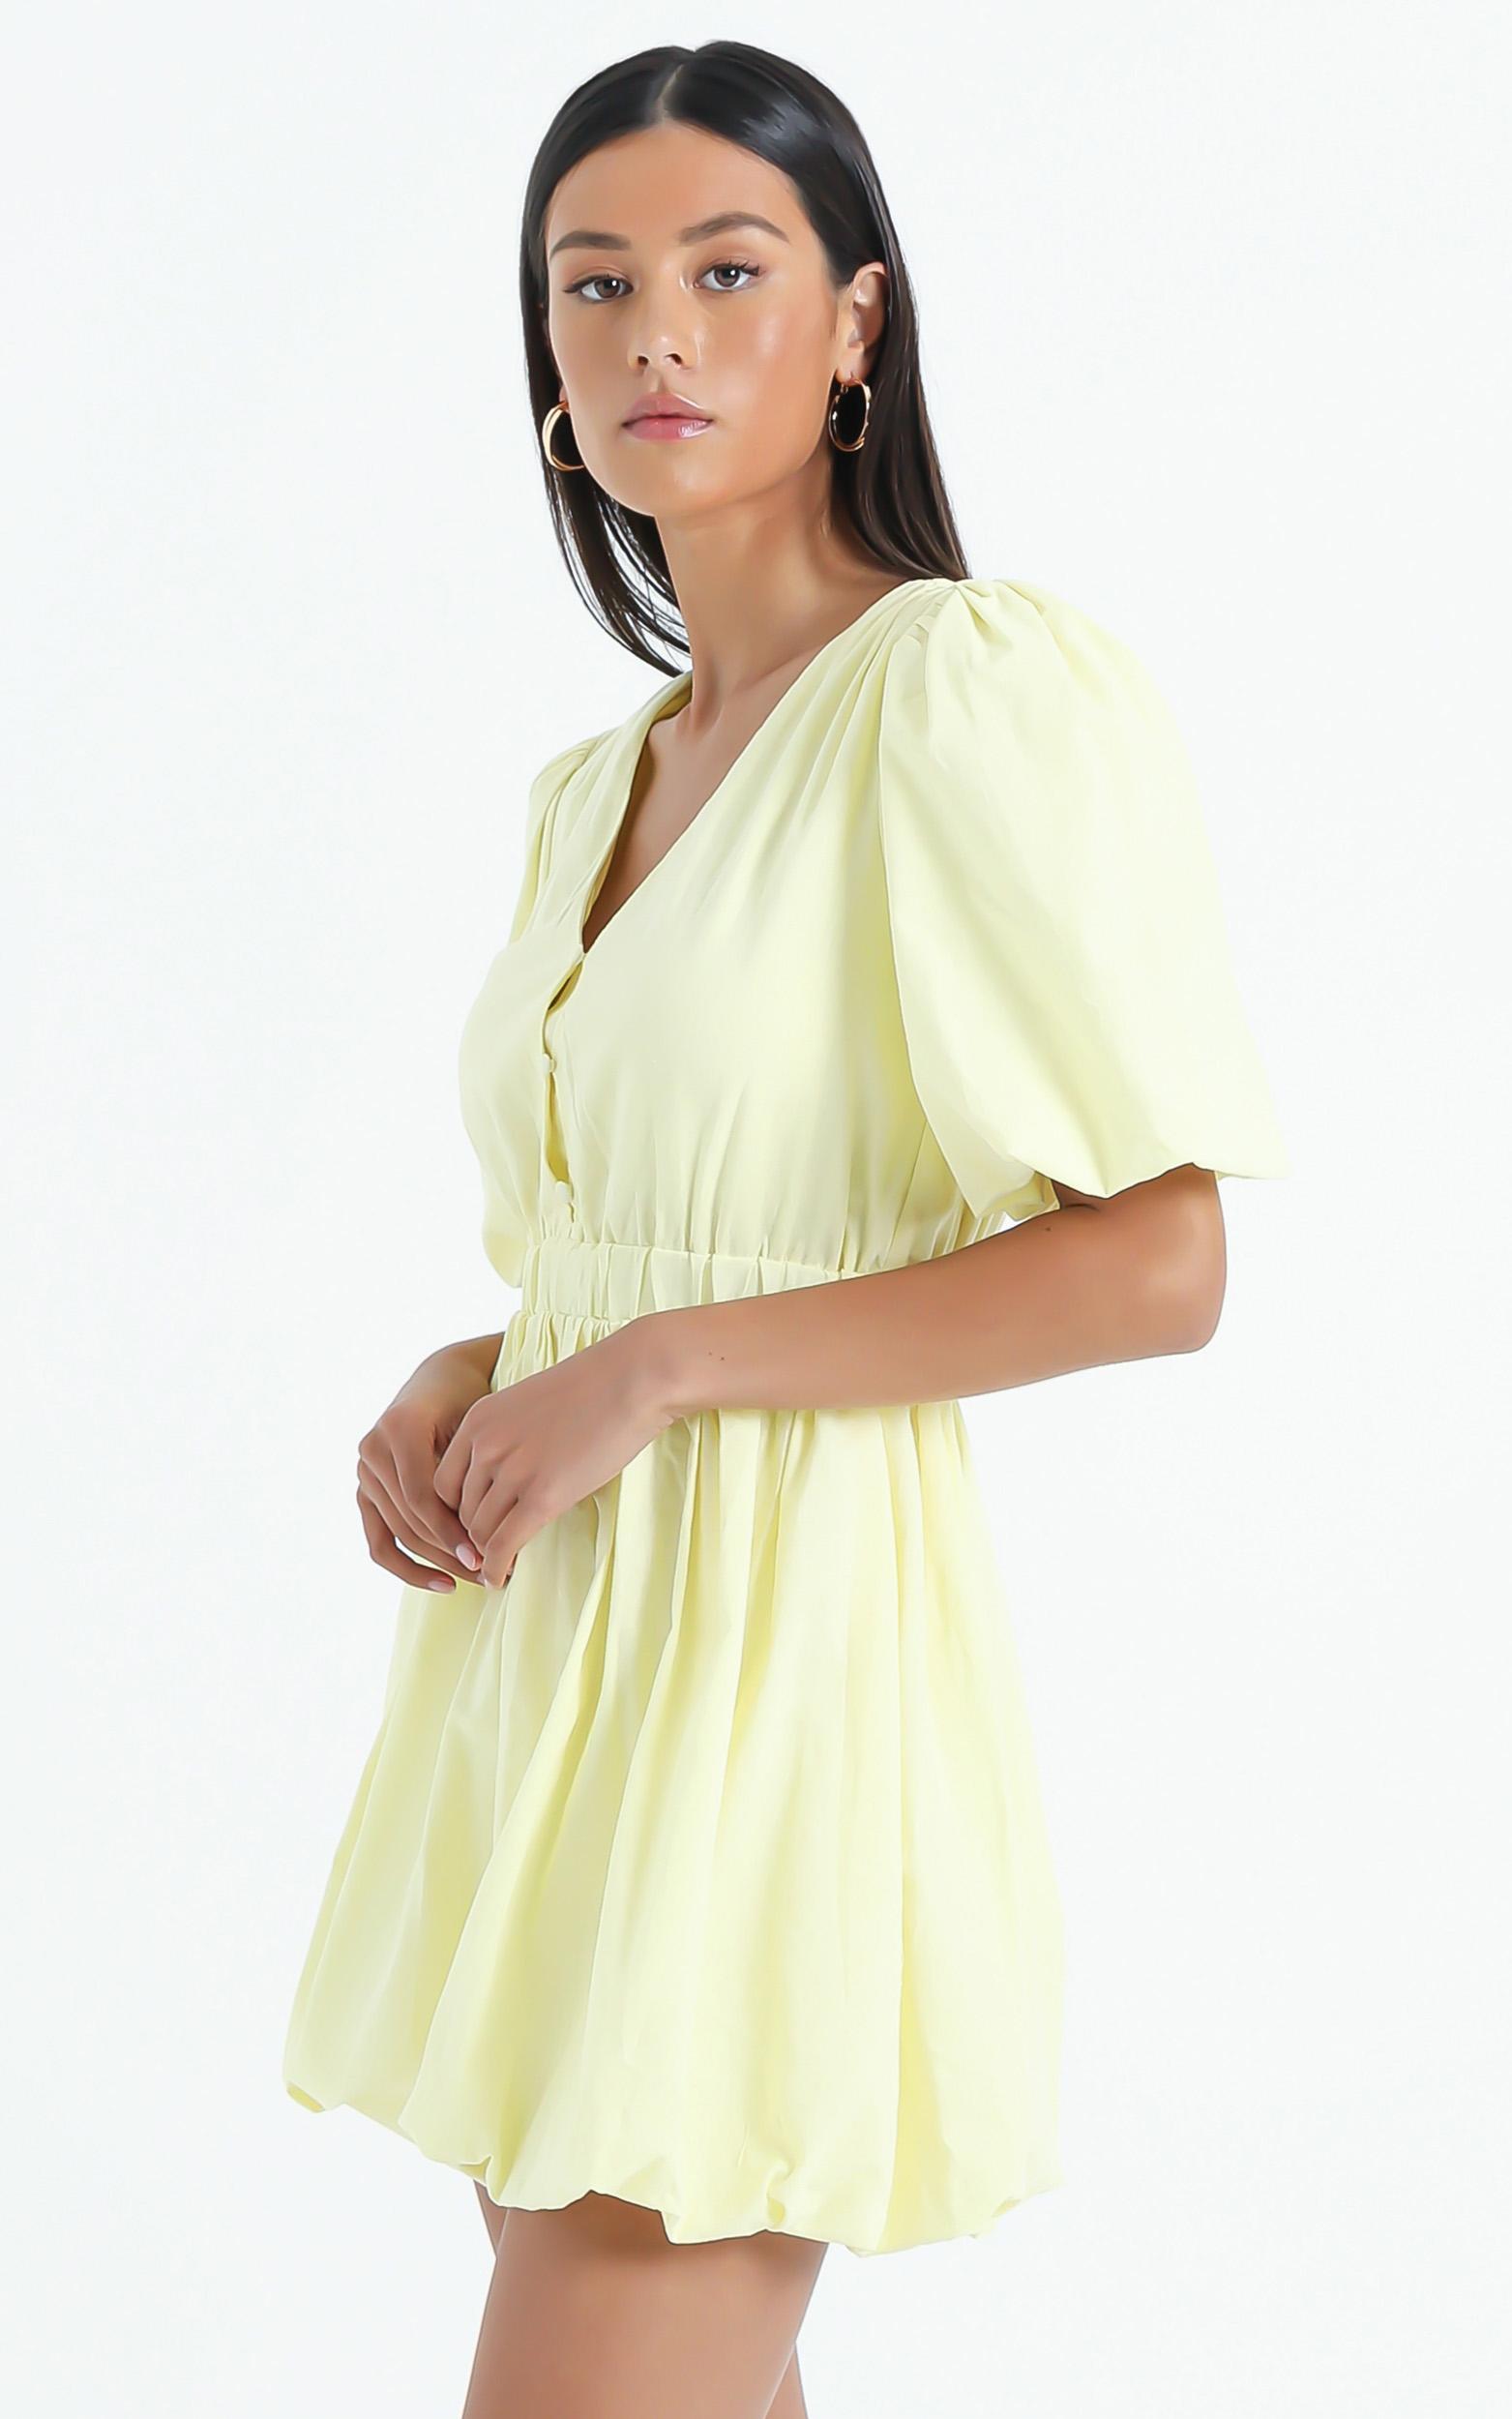 Blathnaid Dress in Lemon - 6 (XS), YEL6, hi-res image number null